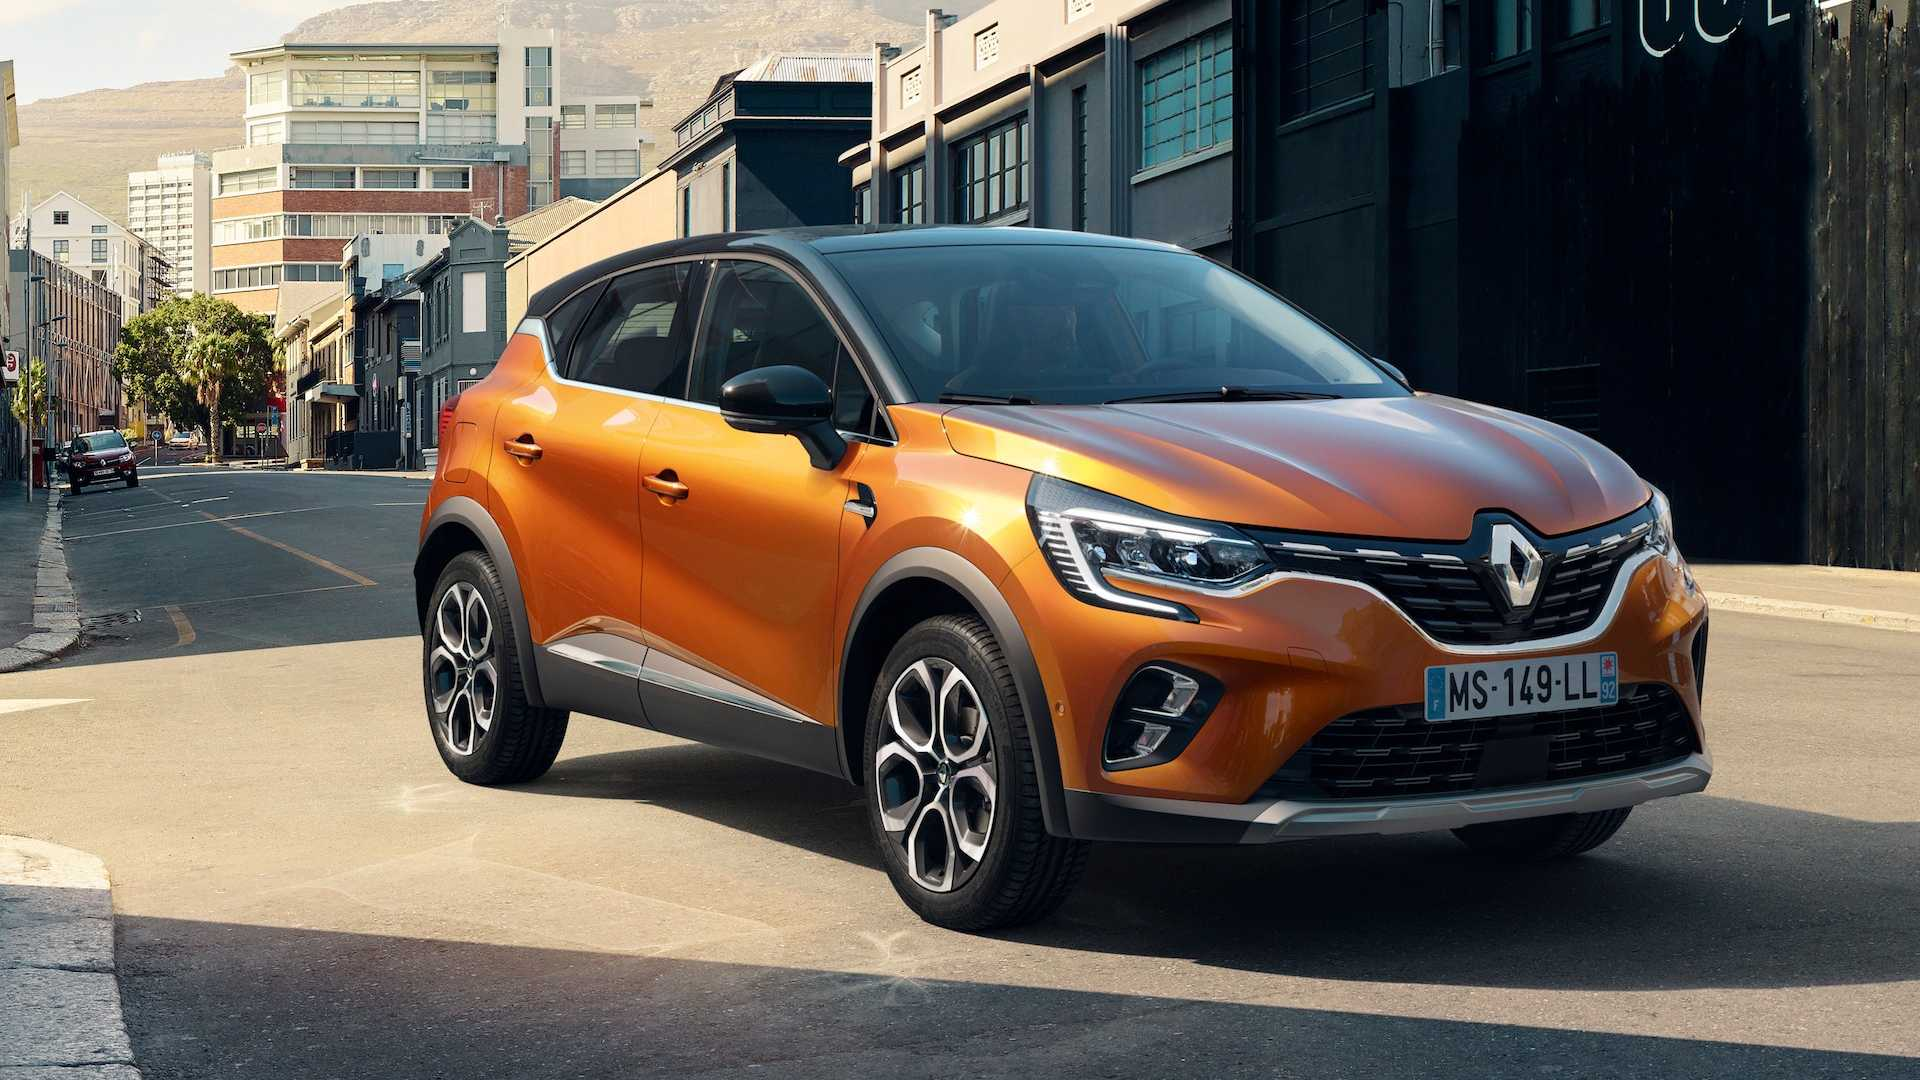 Renault Captur 2020 проедет на электричестве 45 км